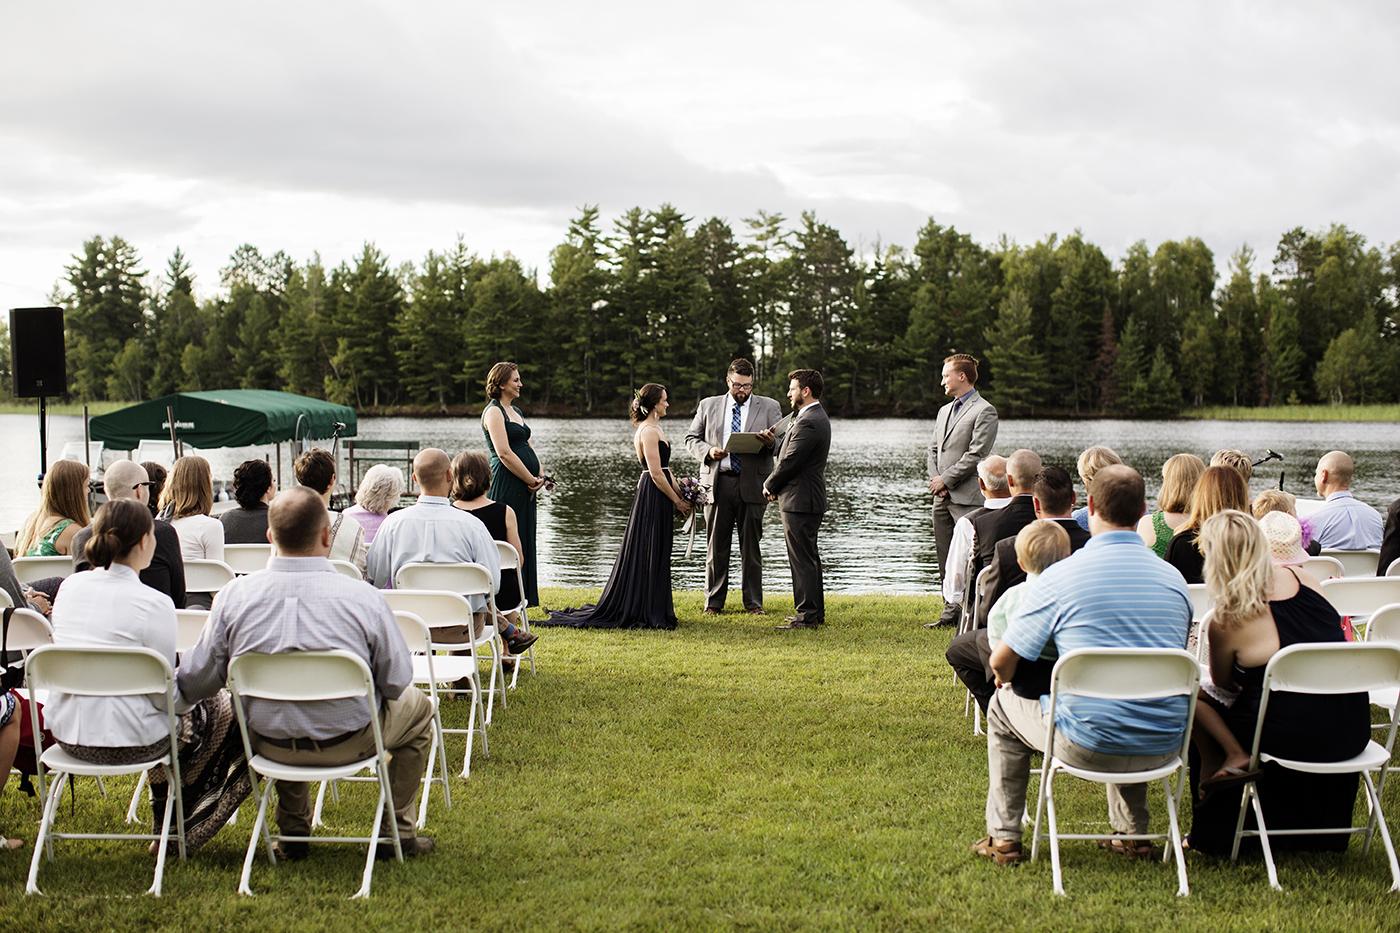 Northern MN Wedding | Minneapolis Wedding Photographer | Photos by Photogen Inc. | Eliesa Johnson | Based in Minneapolis, Minnesota